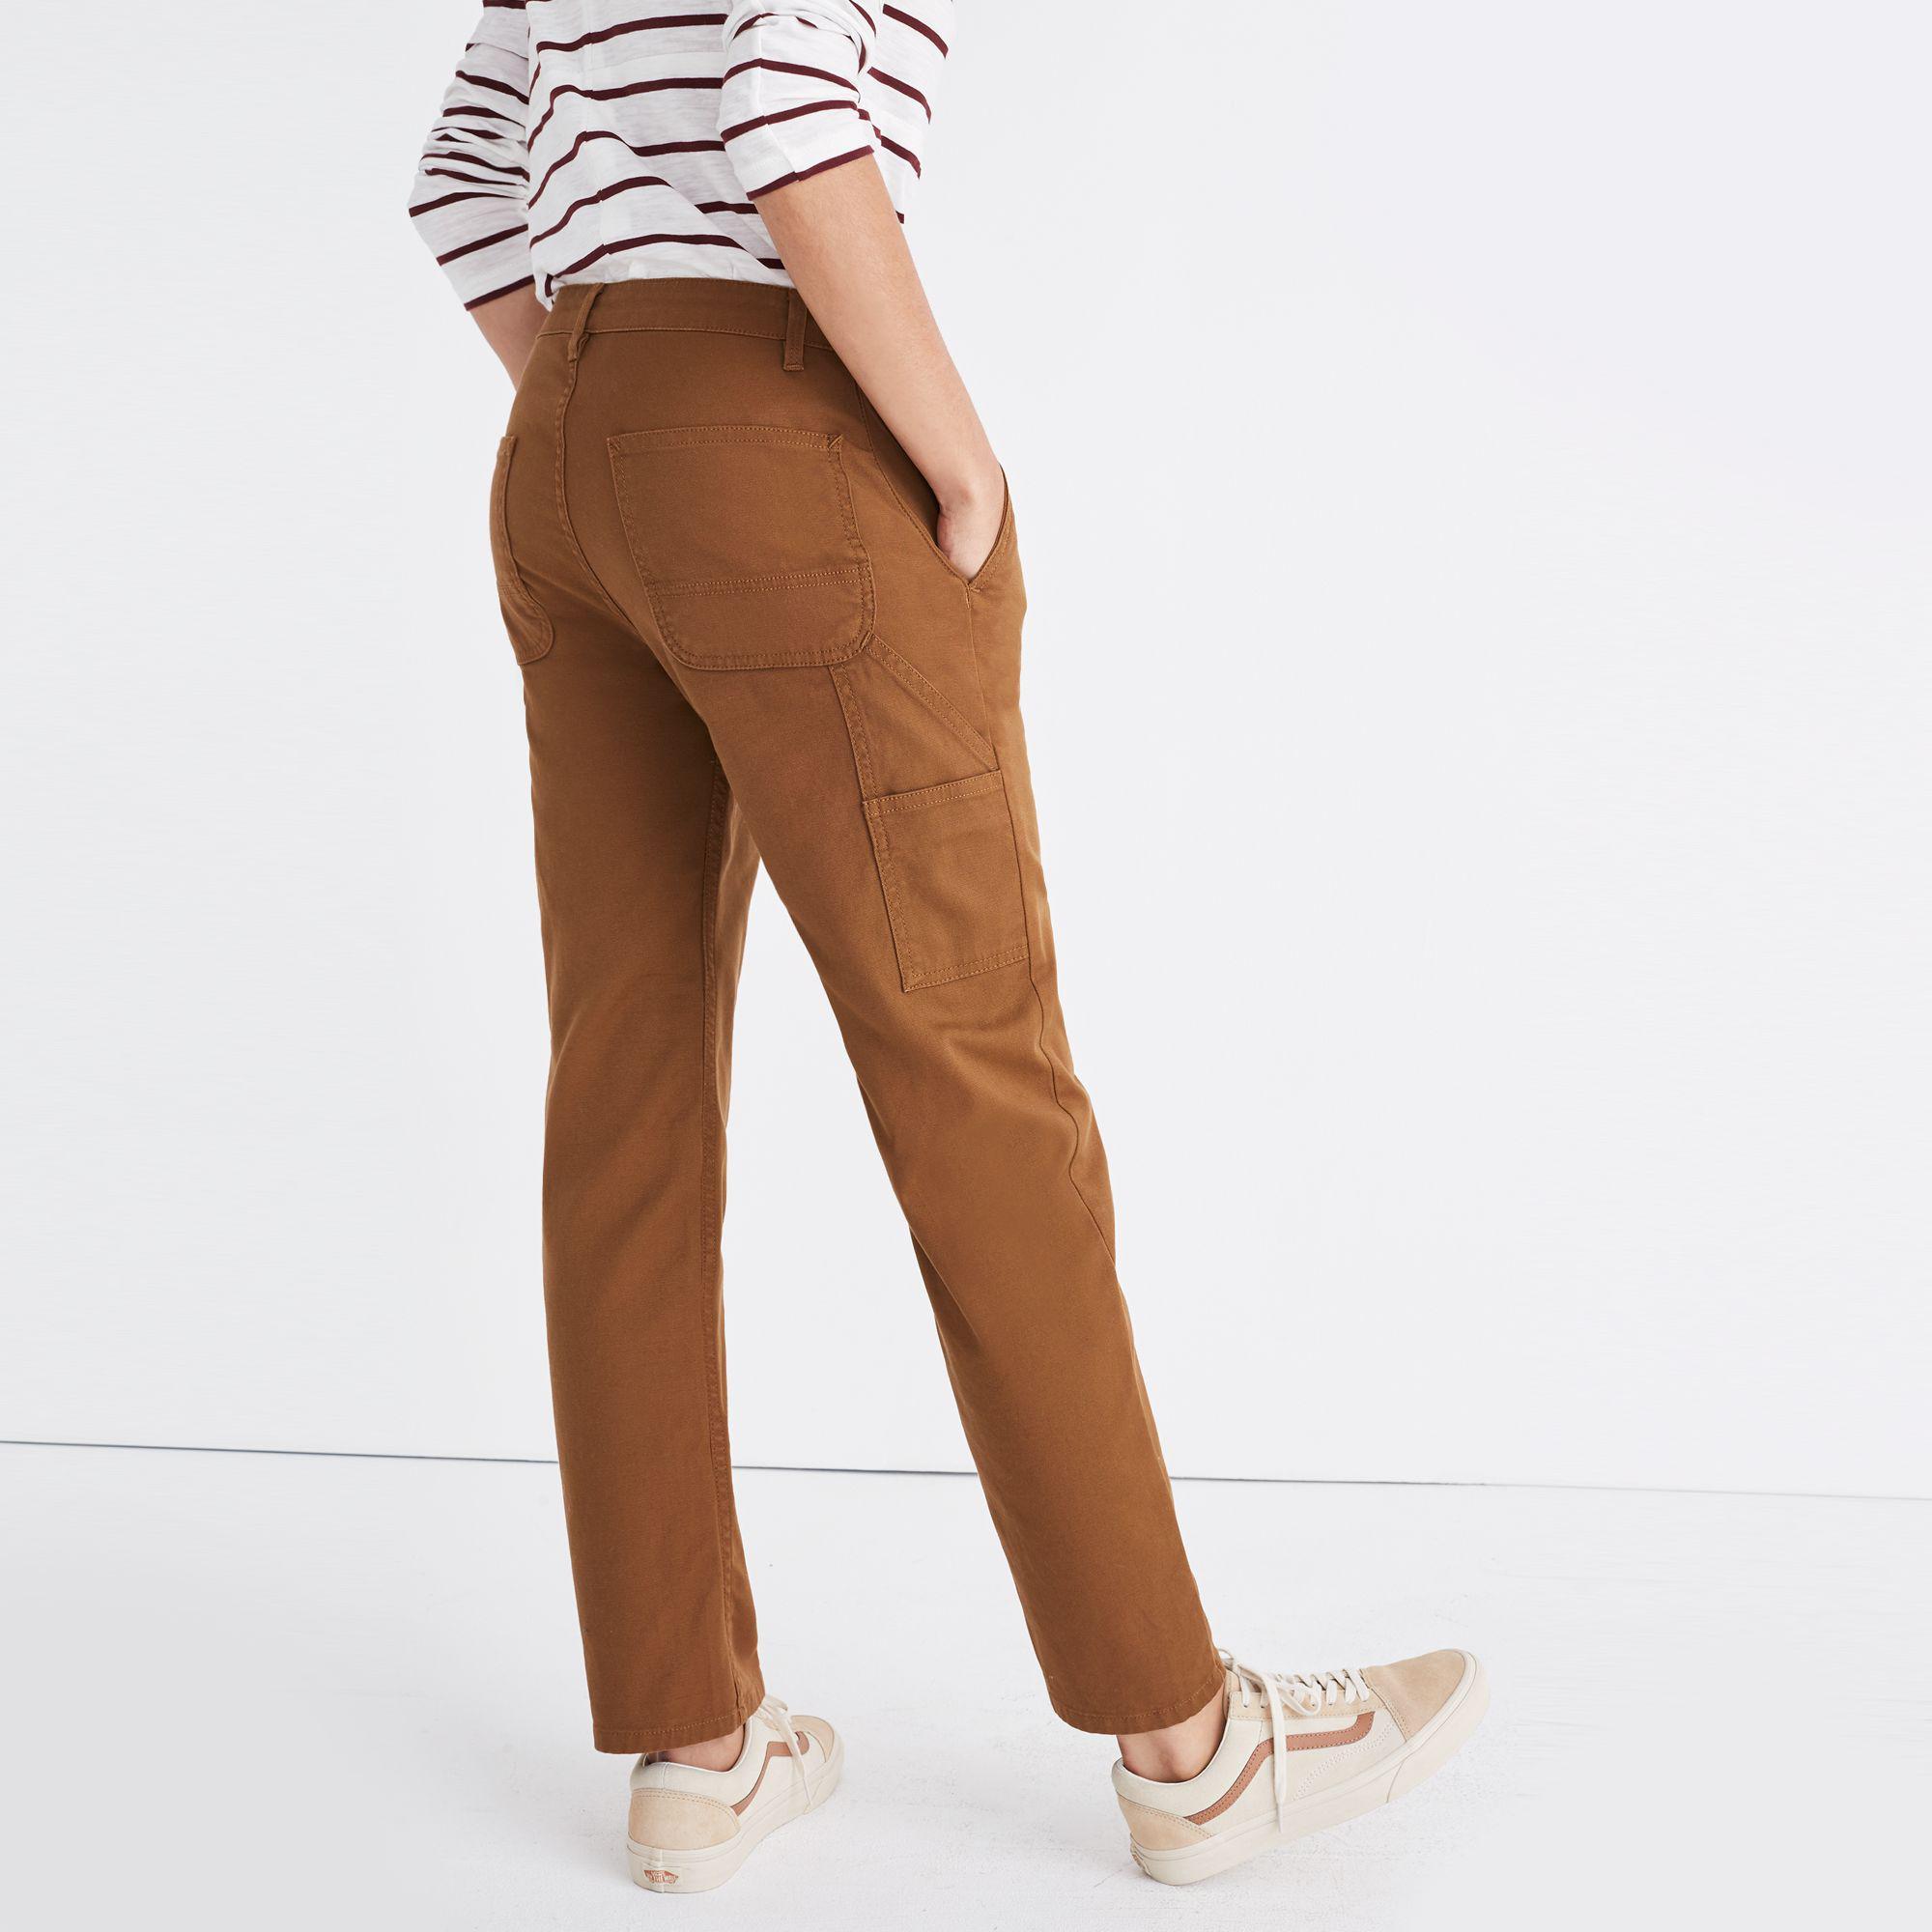 238d831253f2 Lyst - Madewell Carhartt® Work In Progress Pierce Pants in Brown